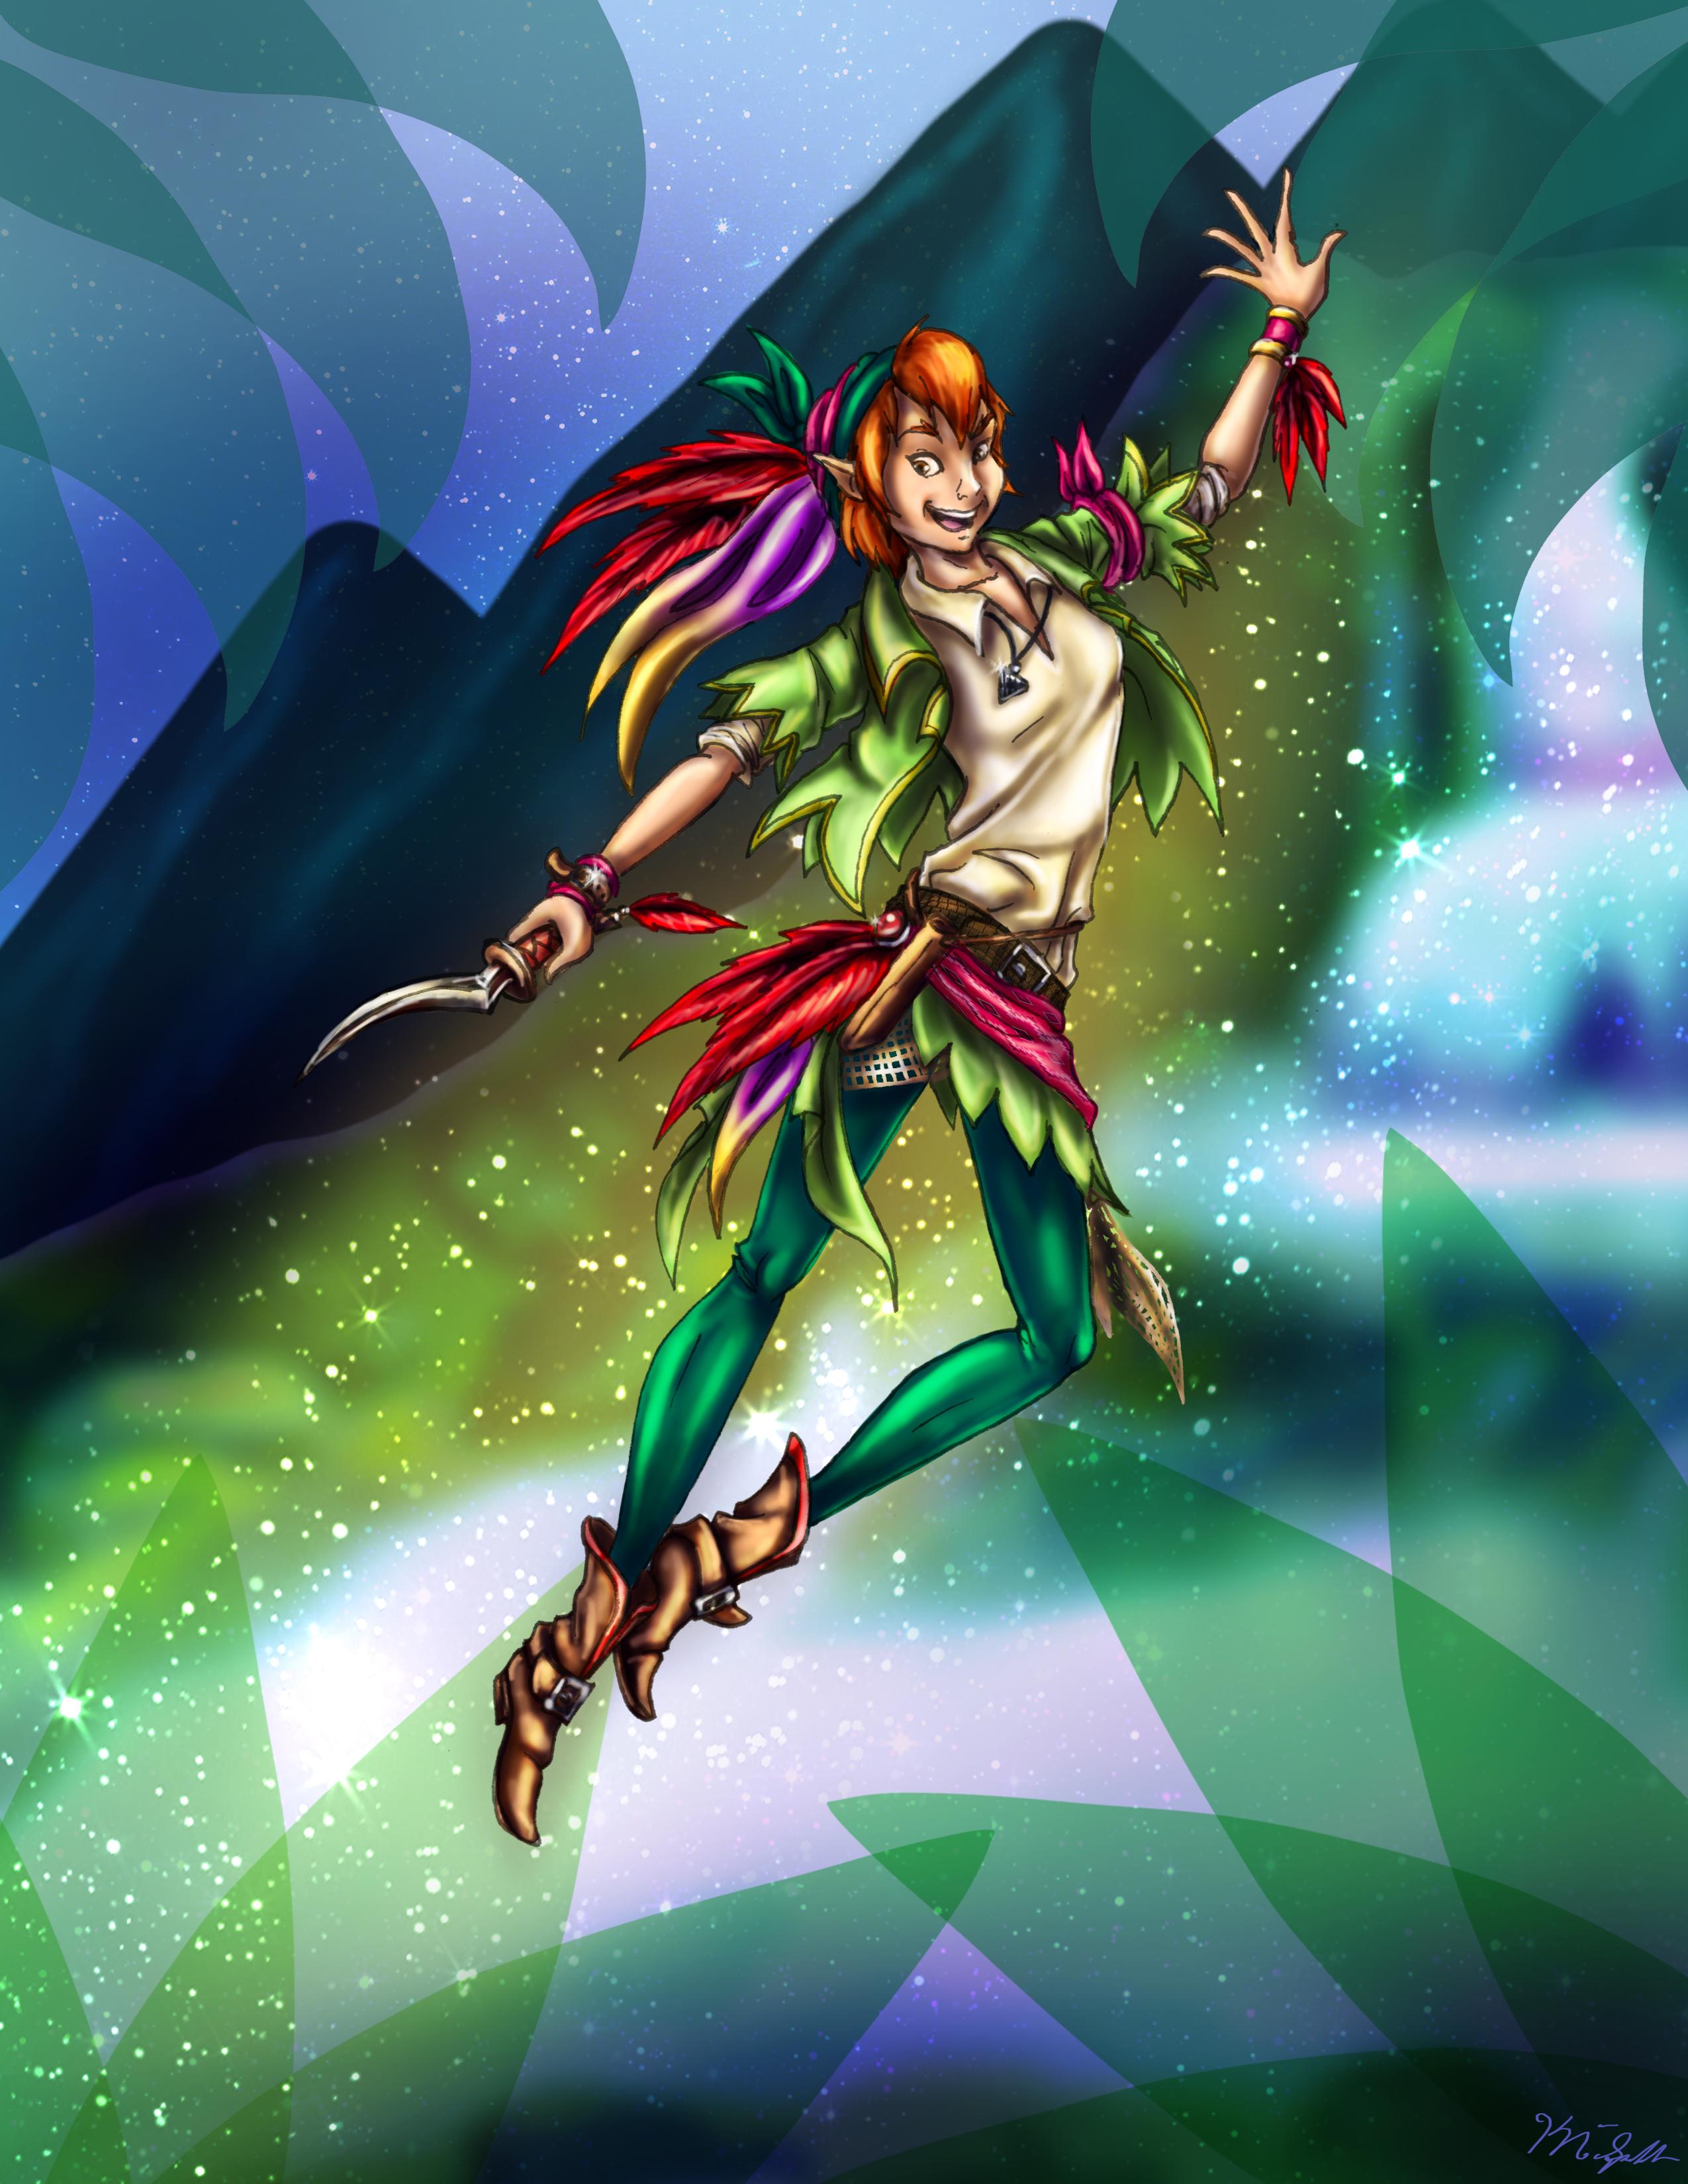 Locke Peter Pan